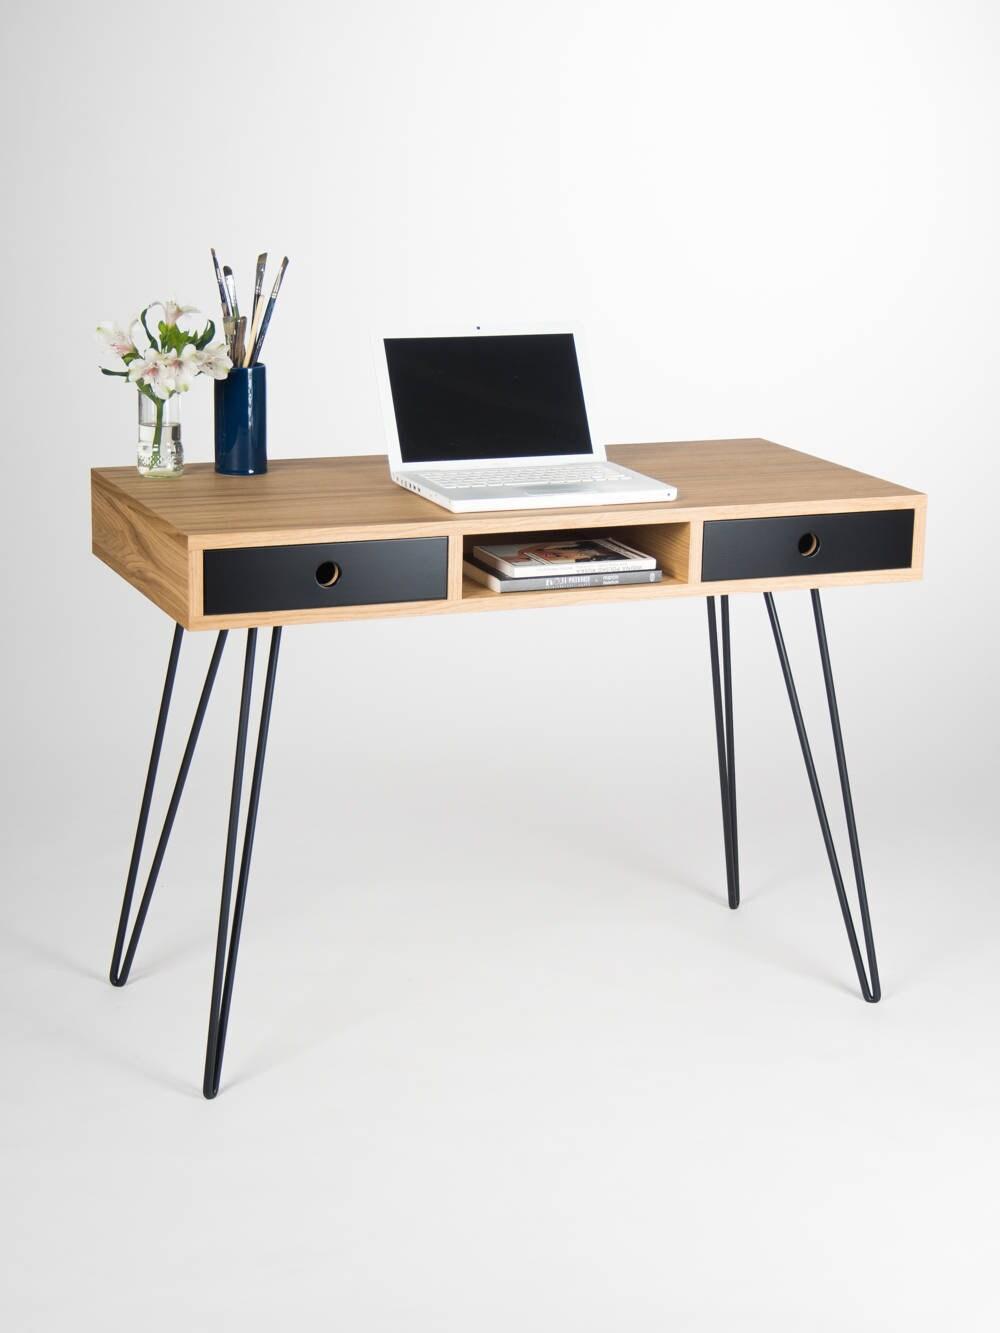 accueil bureau industriel petite table bureau avec tiroirs. Black Bedroom Furniture Sets. Home Design Ideas